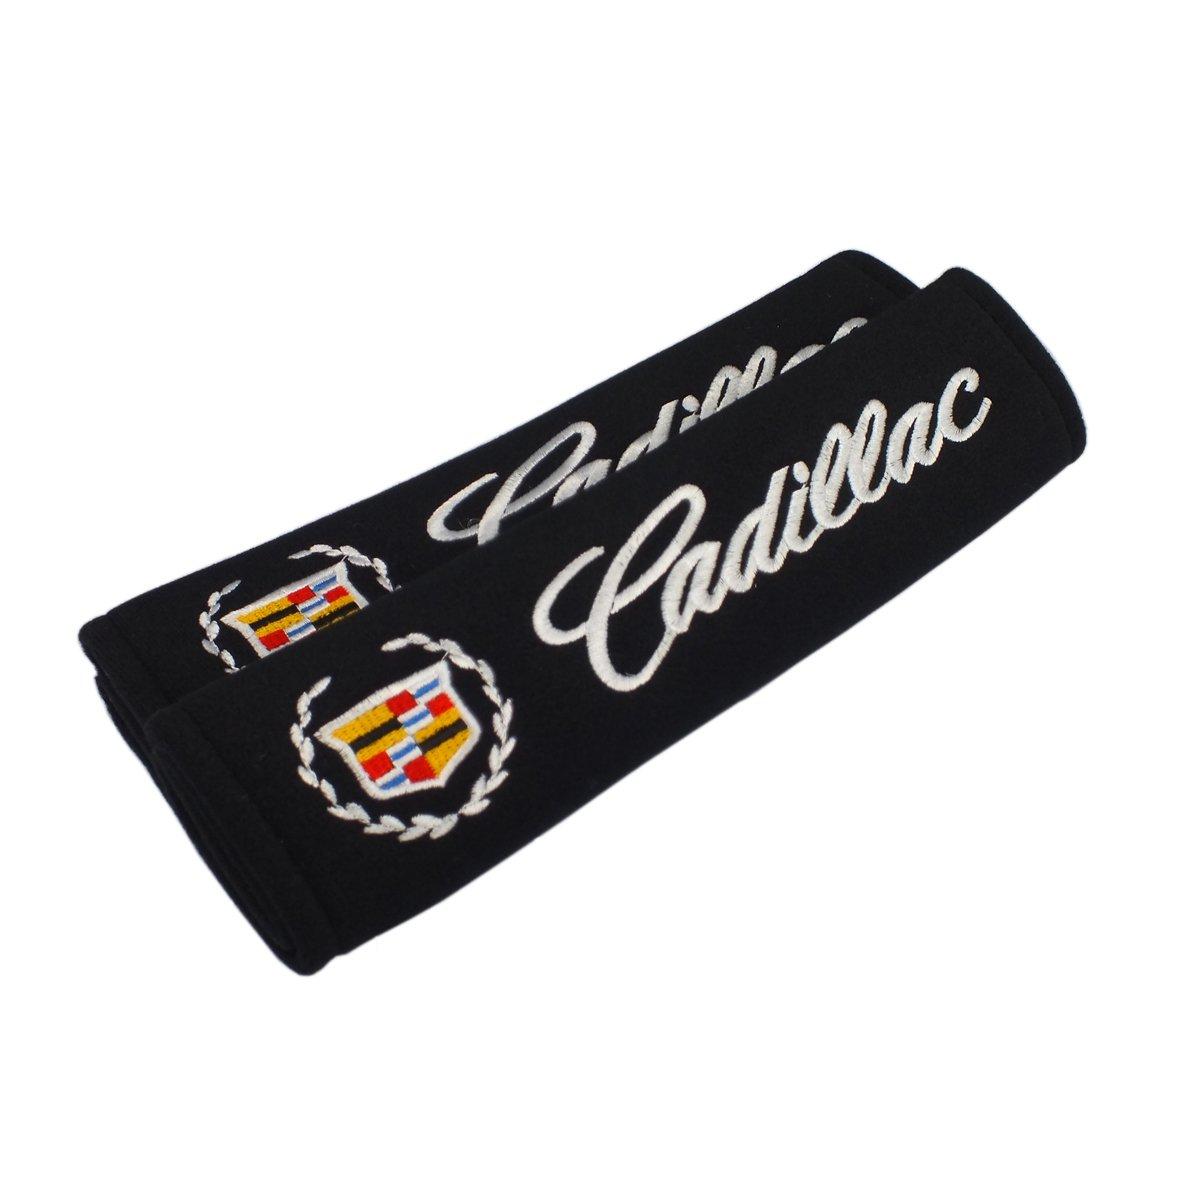 New 1pcs Cadillac Keychain Lanyard Badge Holder 2pair New Cadillac Seat-belt Shoulder Pads